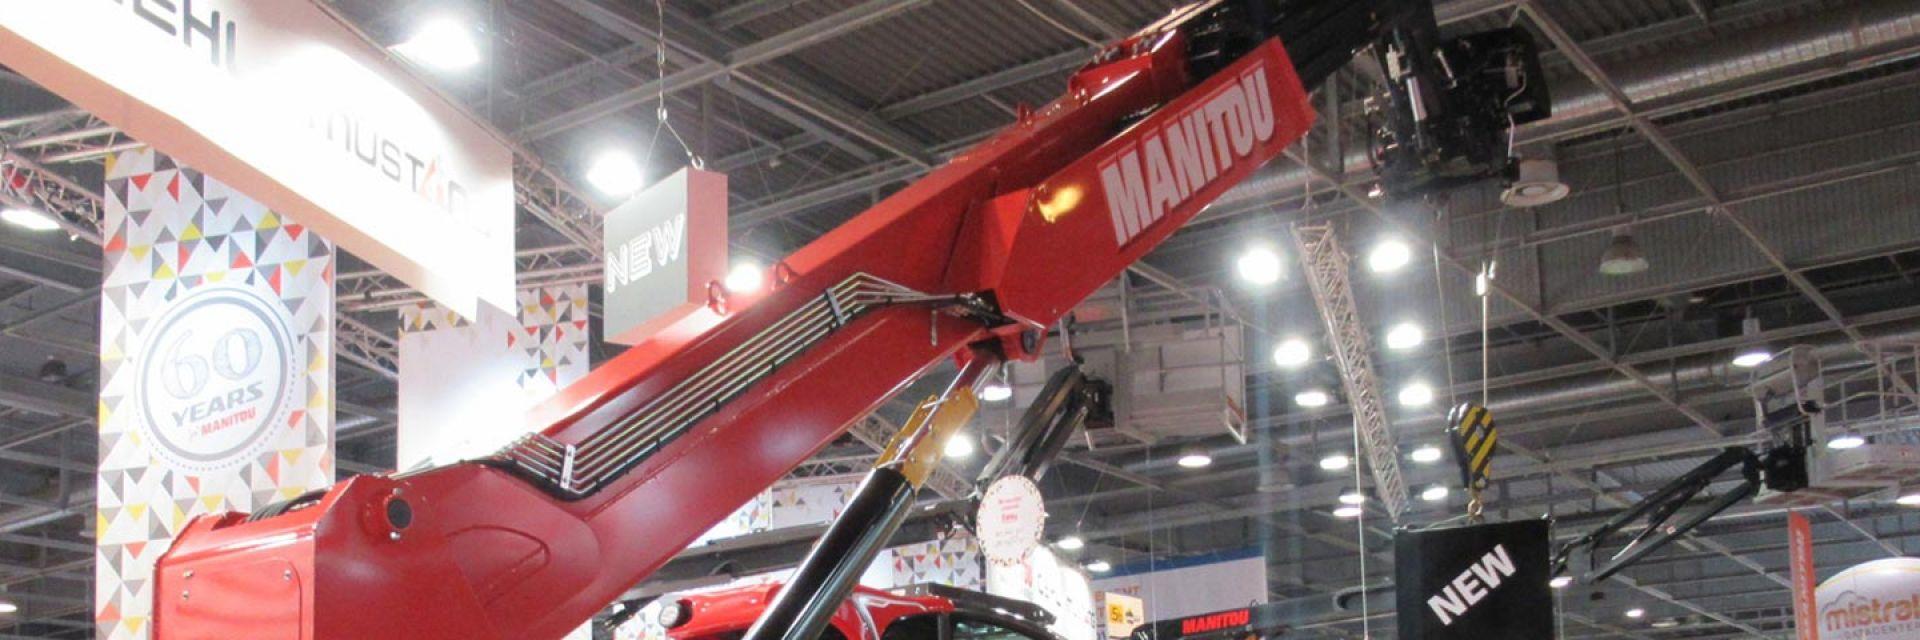 Maquinaria marca Manitou